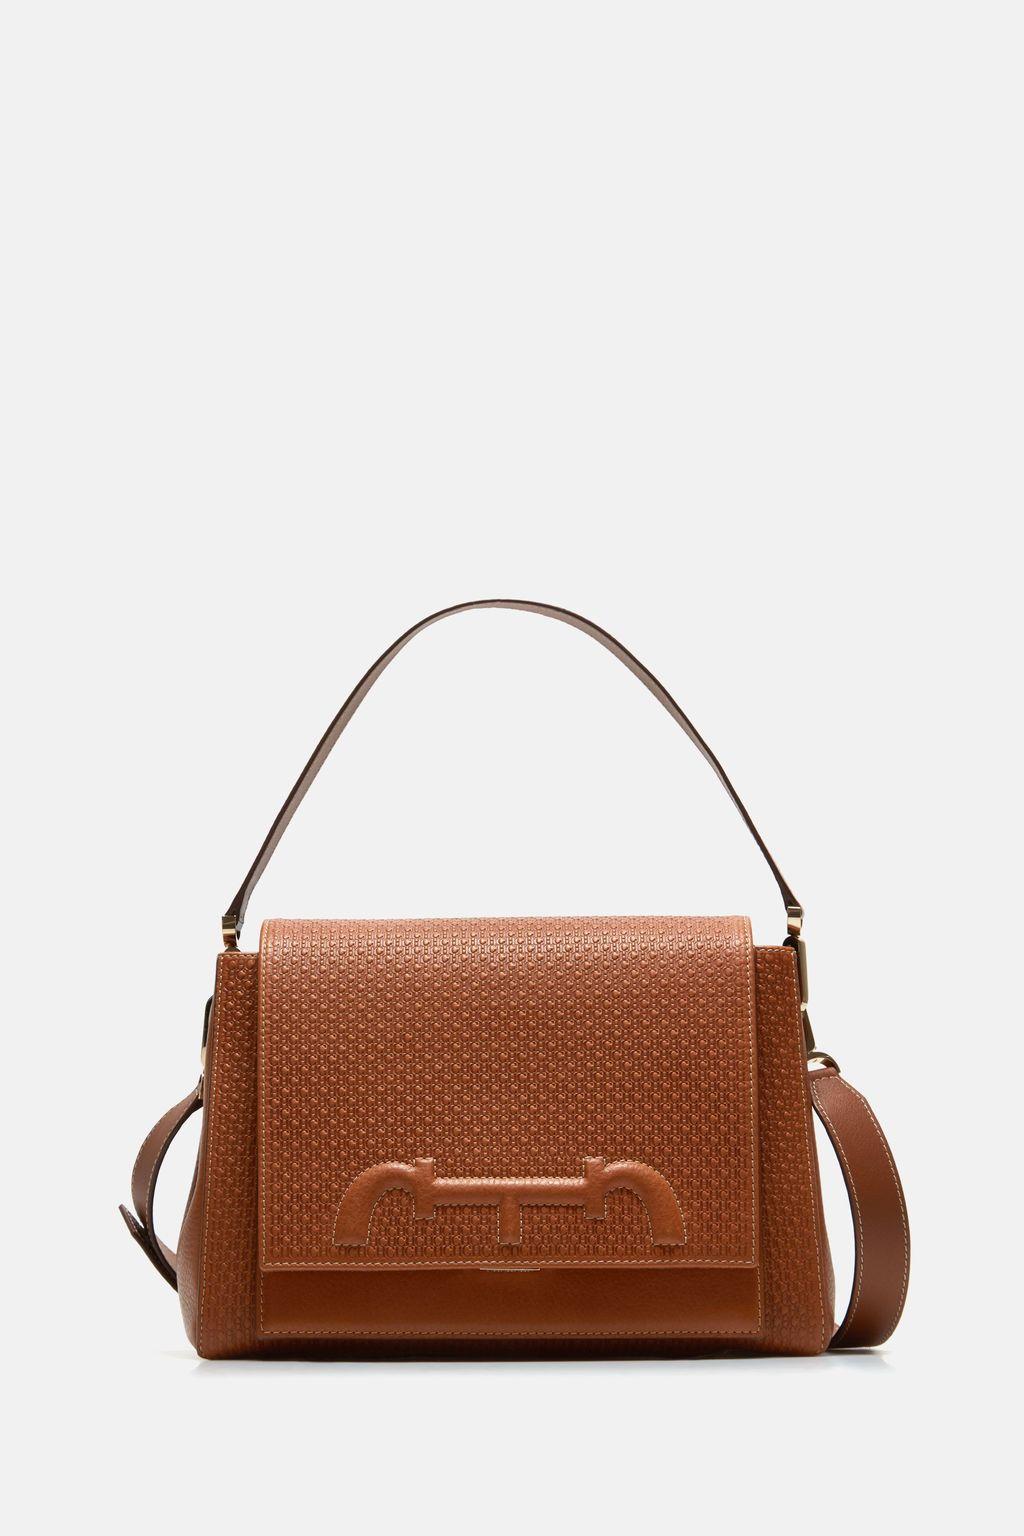 Doma Insignia | Medium shoulder bag